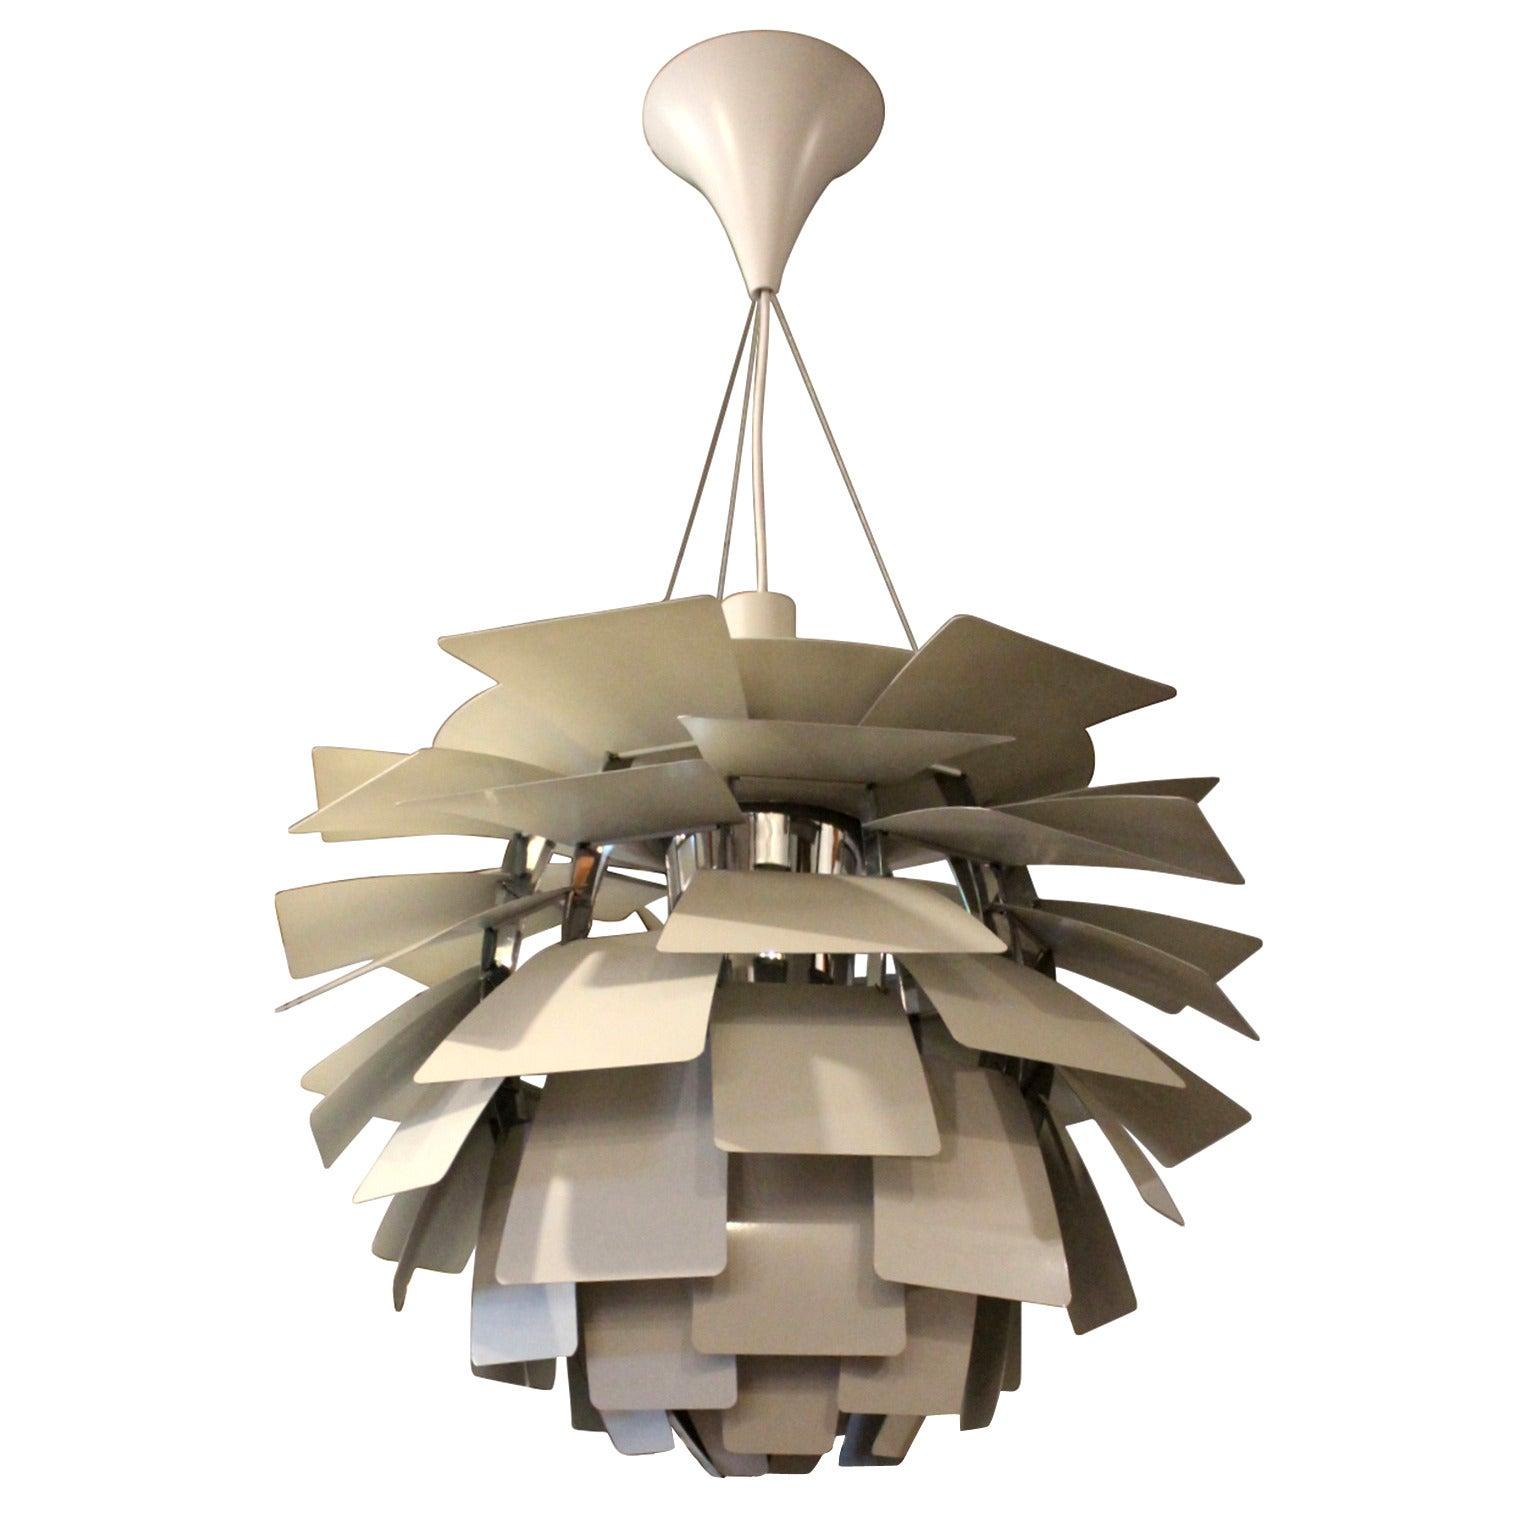 Artichoke Pendant Designed by Poul Henningsen